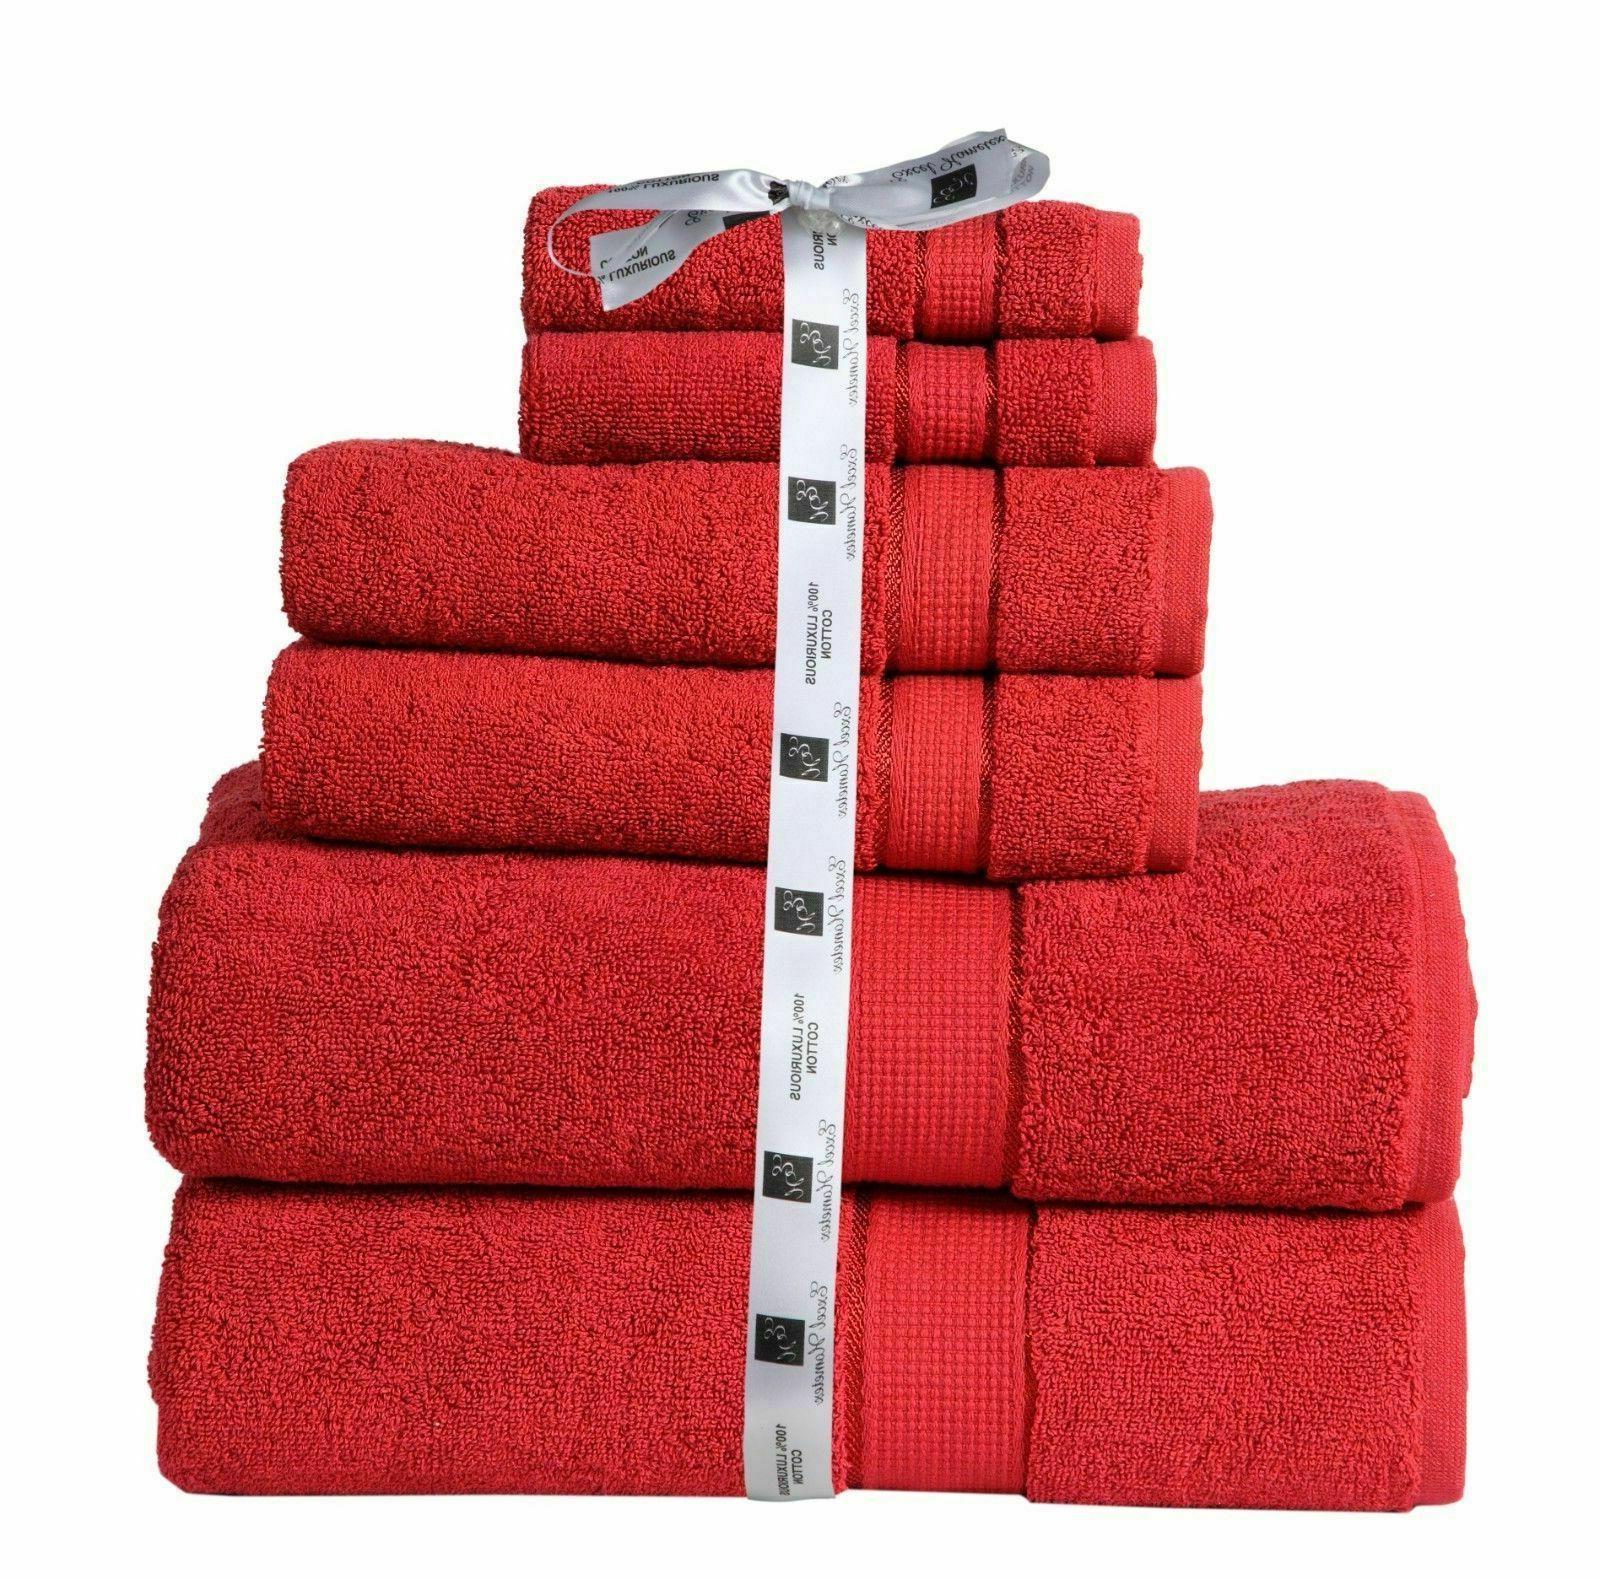 Towel Set Piece Set Cotton 2 Hand 4